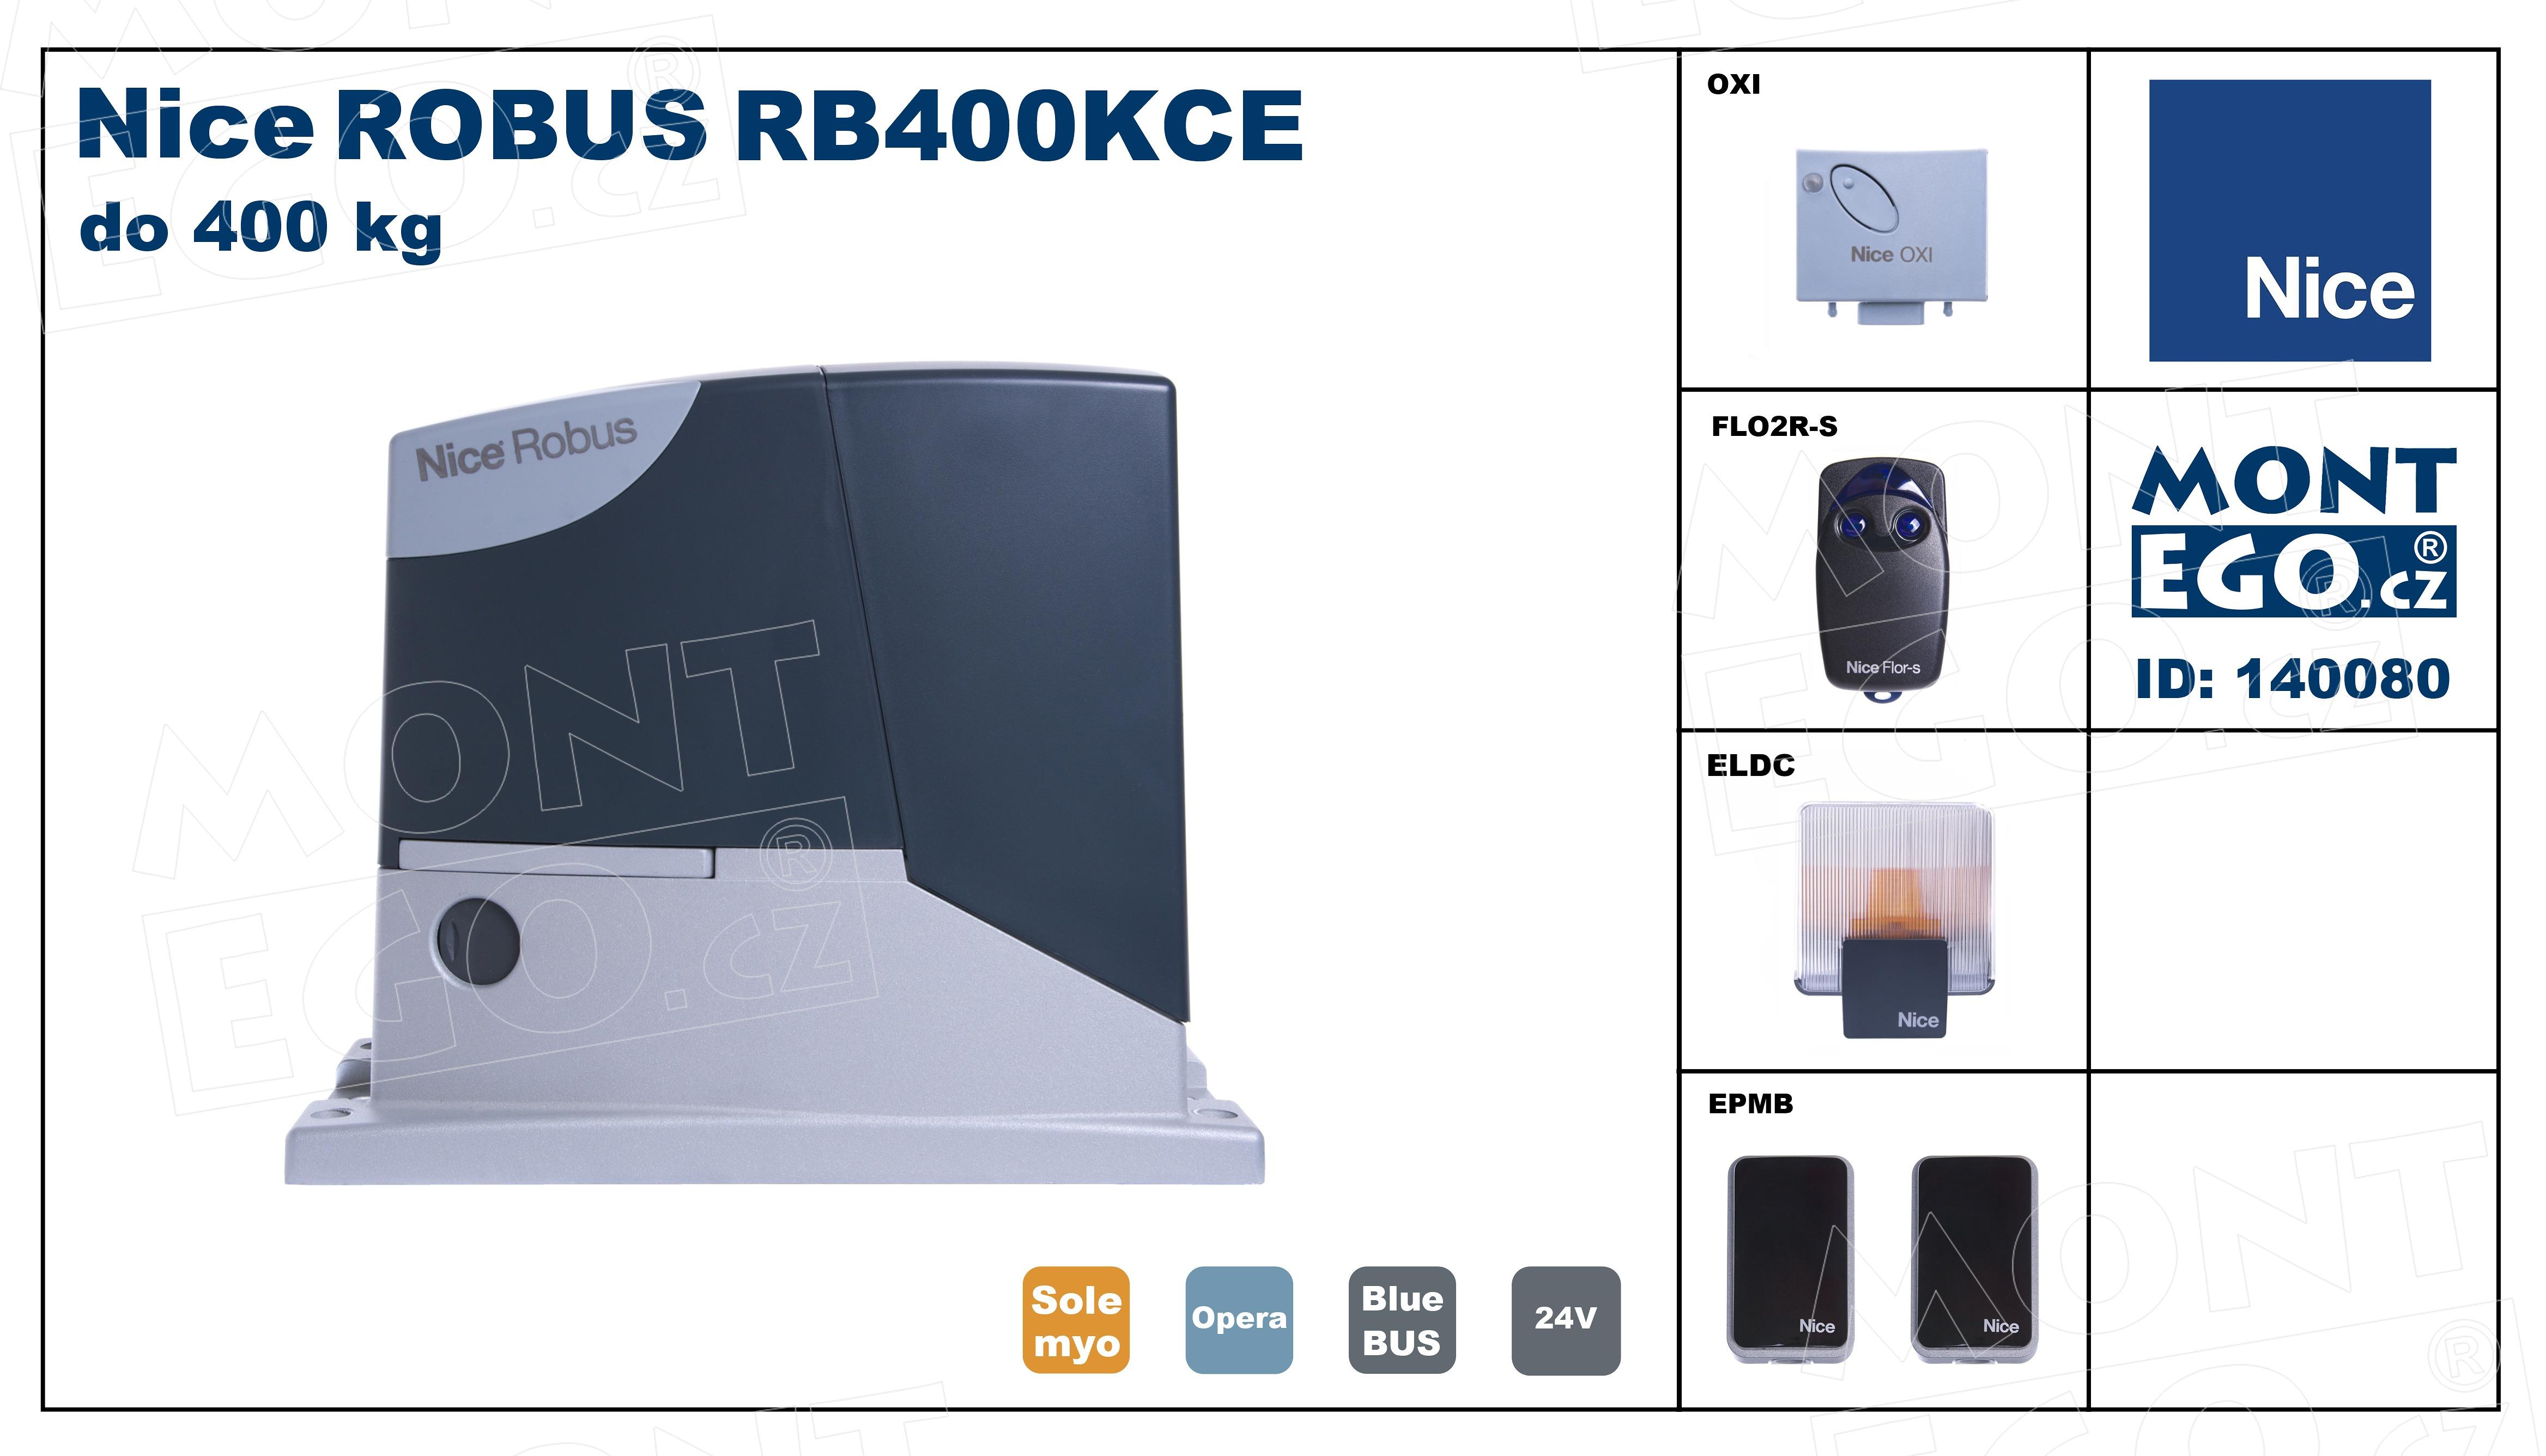 Robus400 Kit RB400KCE sada pohonu posuvné brány do 400 Kg RB400